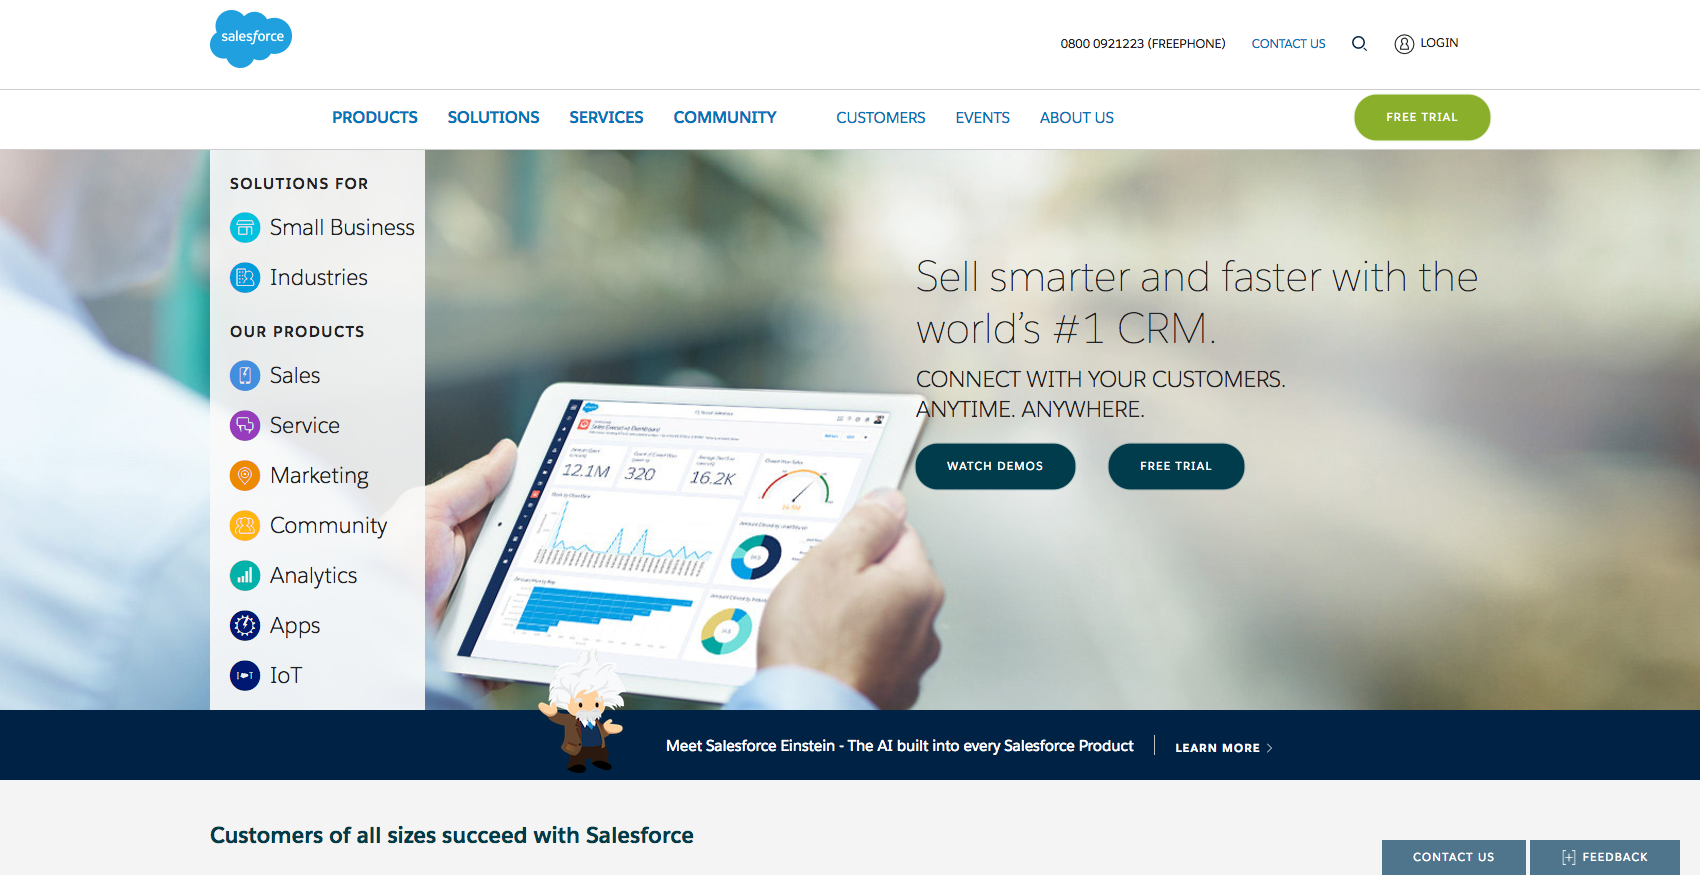 Saleforce-UK-screenshot